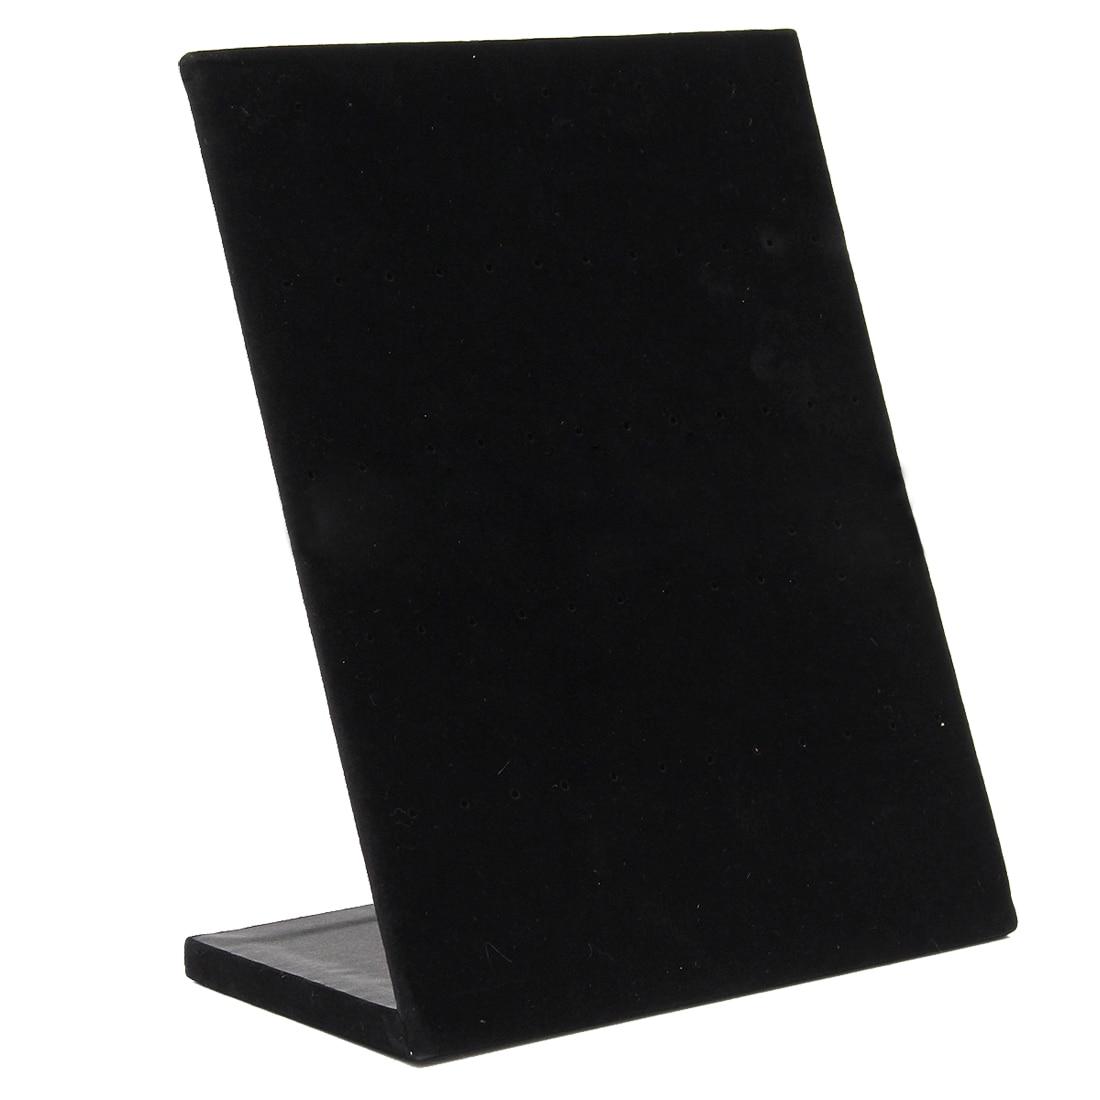 Velvet Display Stand 30 Pair Earring Standcolor Jewelery Black